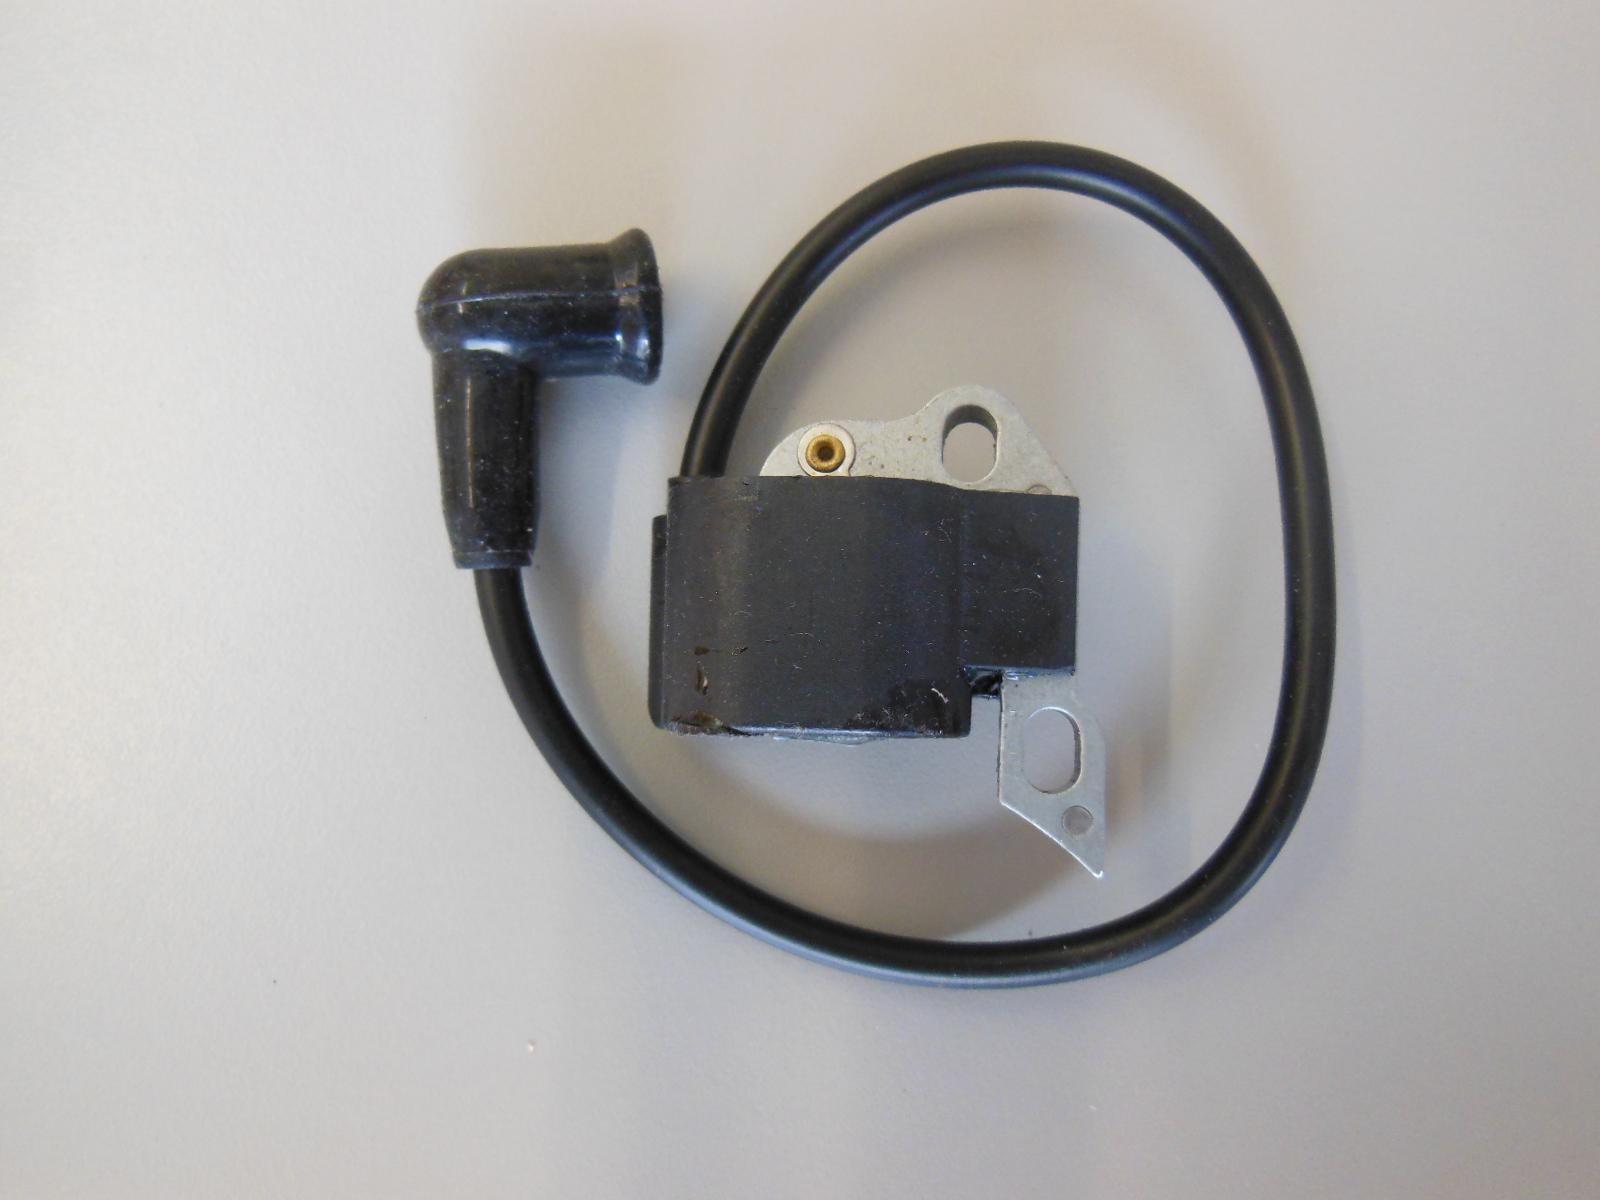 bobina de ensendido adecuado soplador stihl br340 br380 br400 br420 sr320 sr400 sr420 ebay. Black Bedroom Furniture Sets. Home Design Ideas